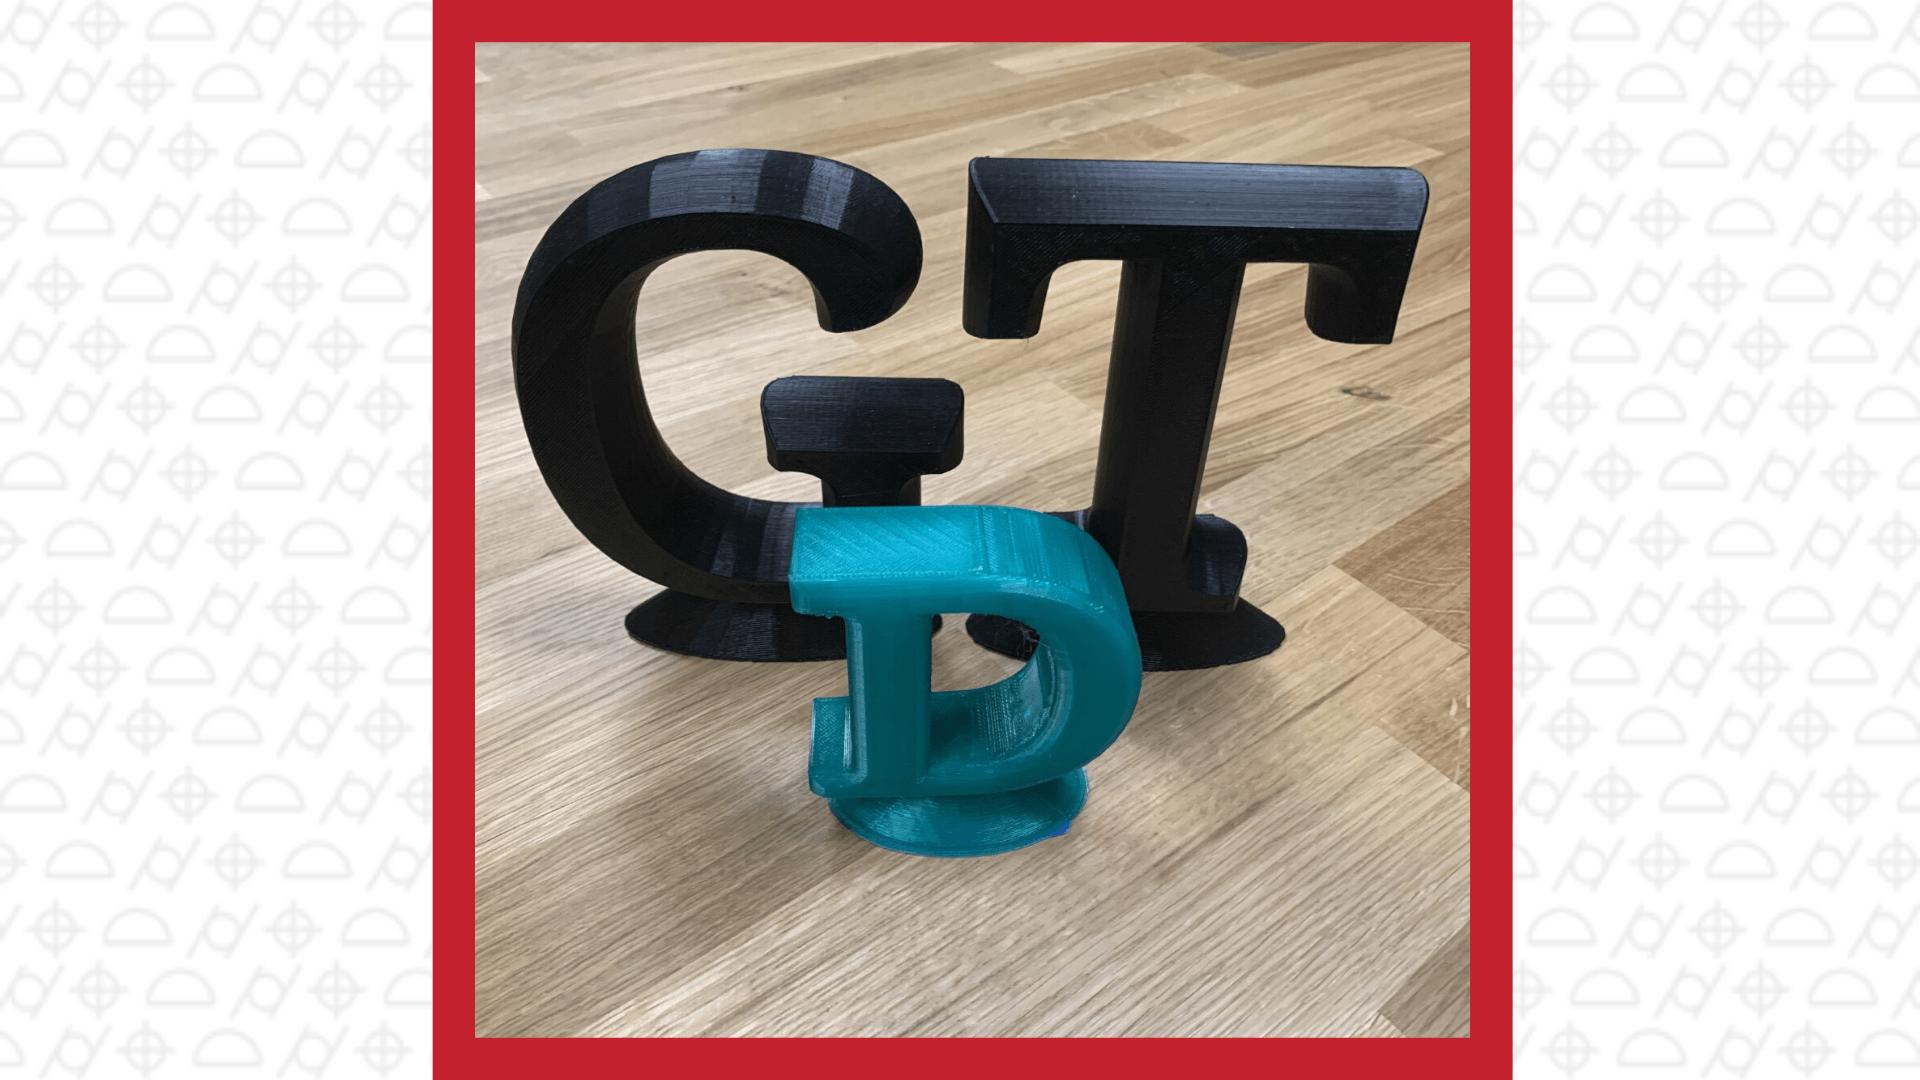 3D printed capital letters black G, black T, smaller sized blue D